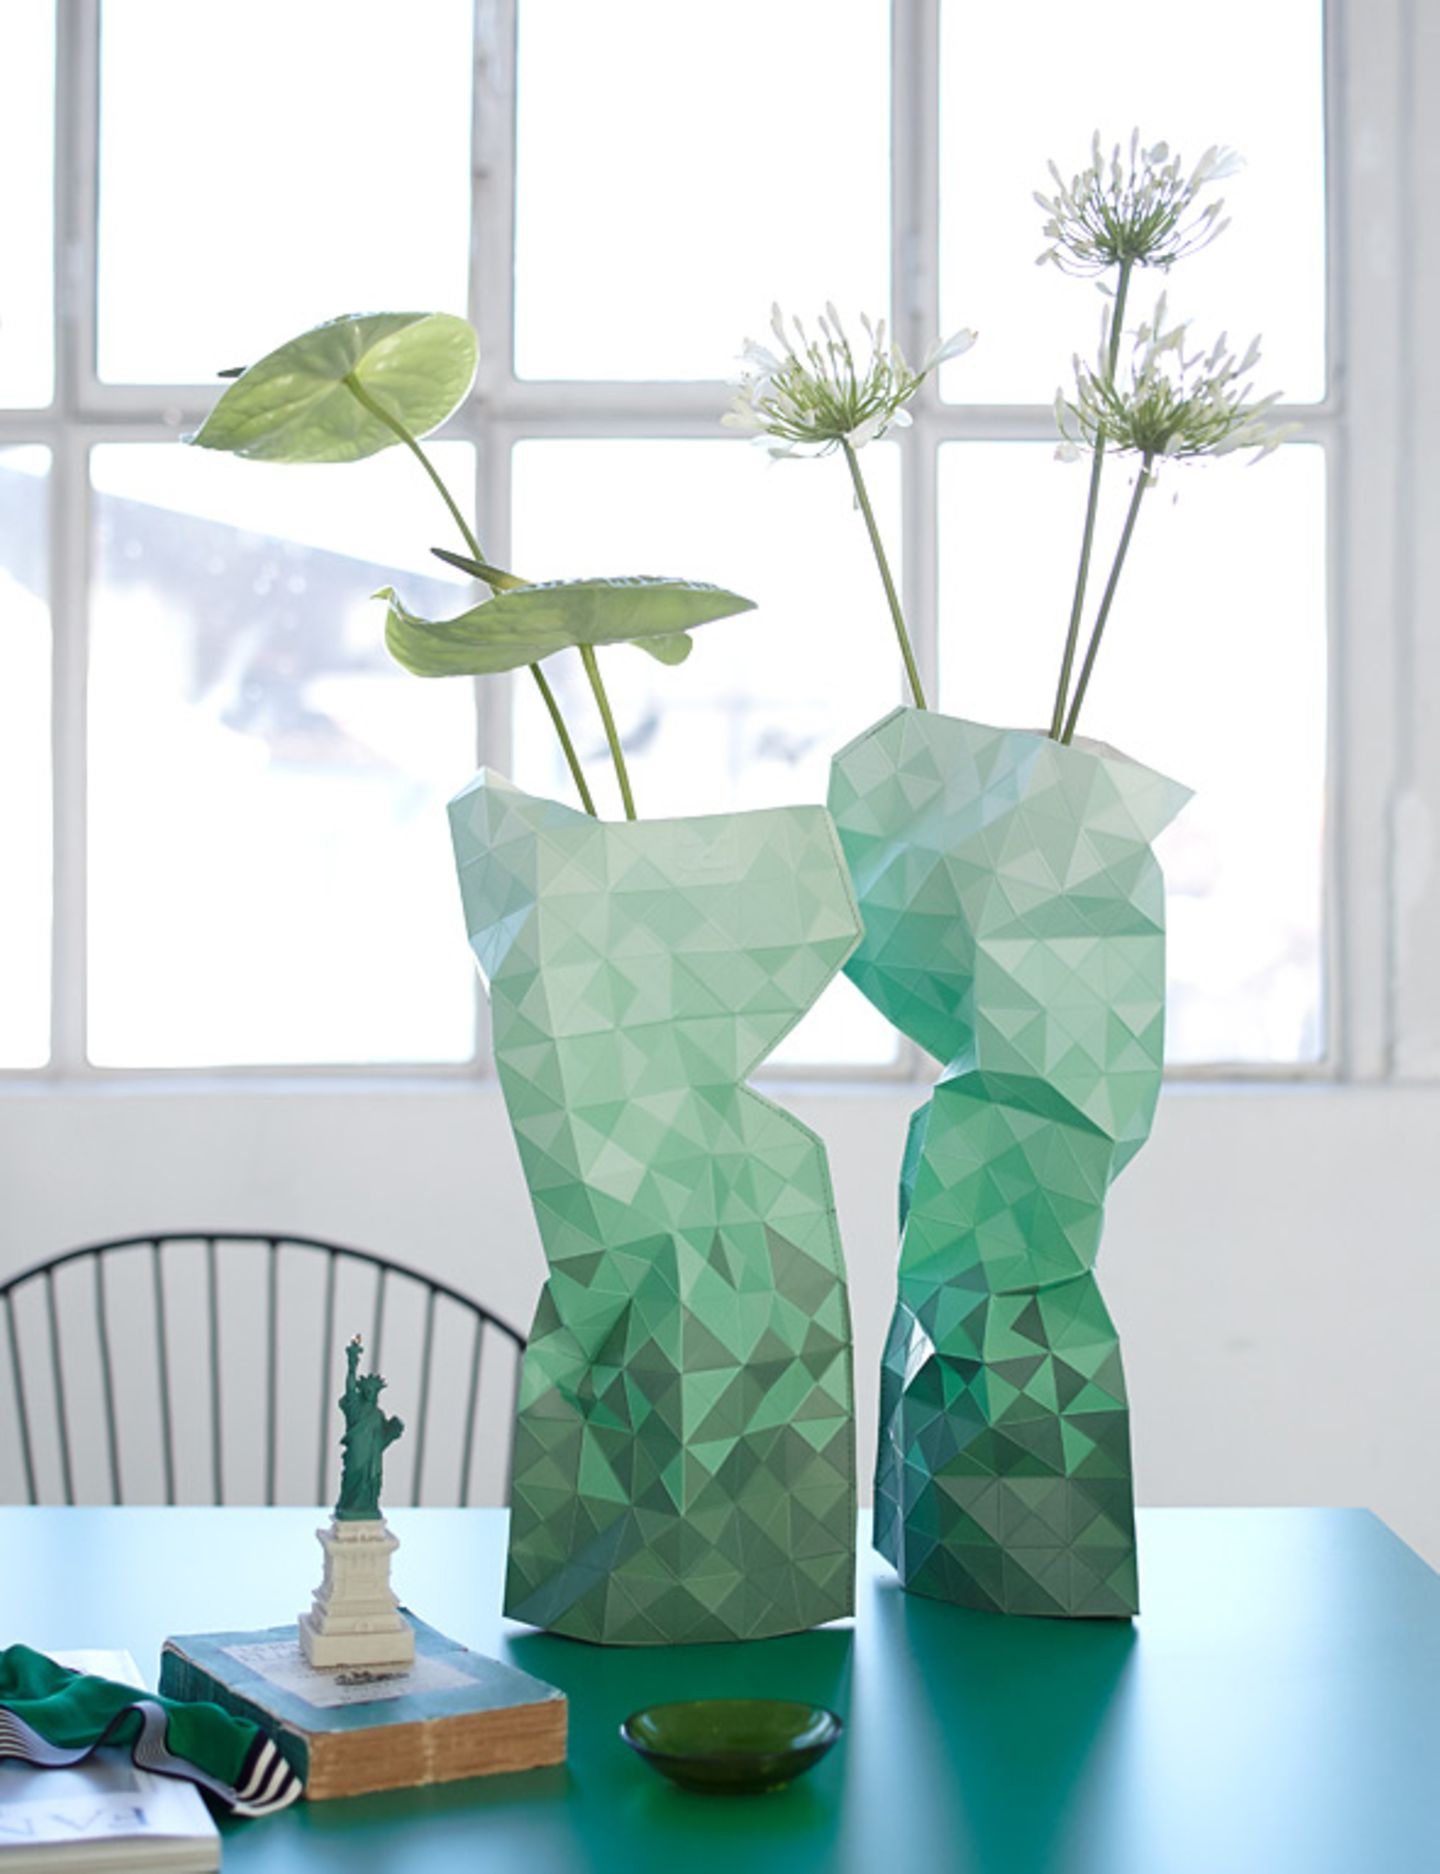 Papiervase in Smaragdgrün